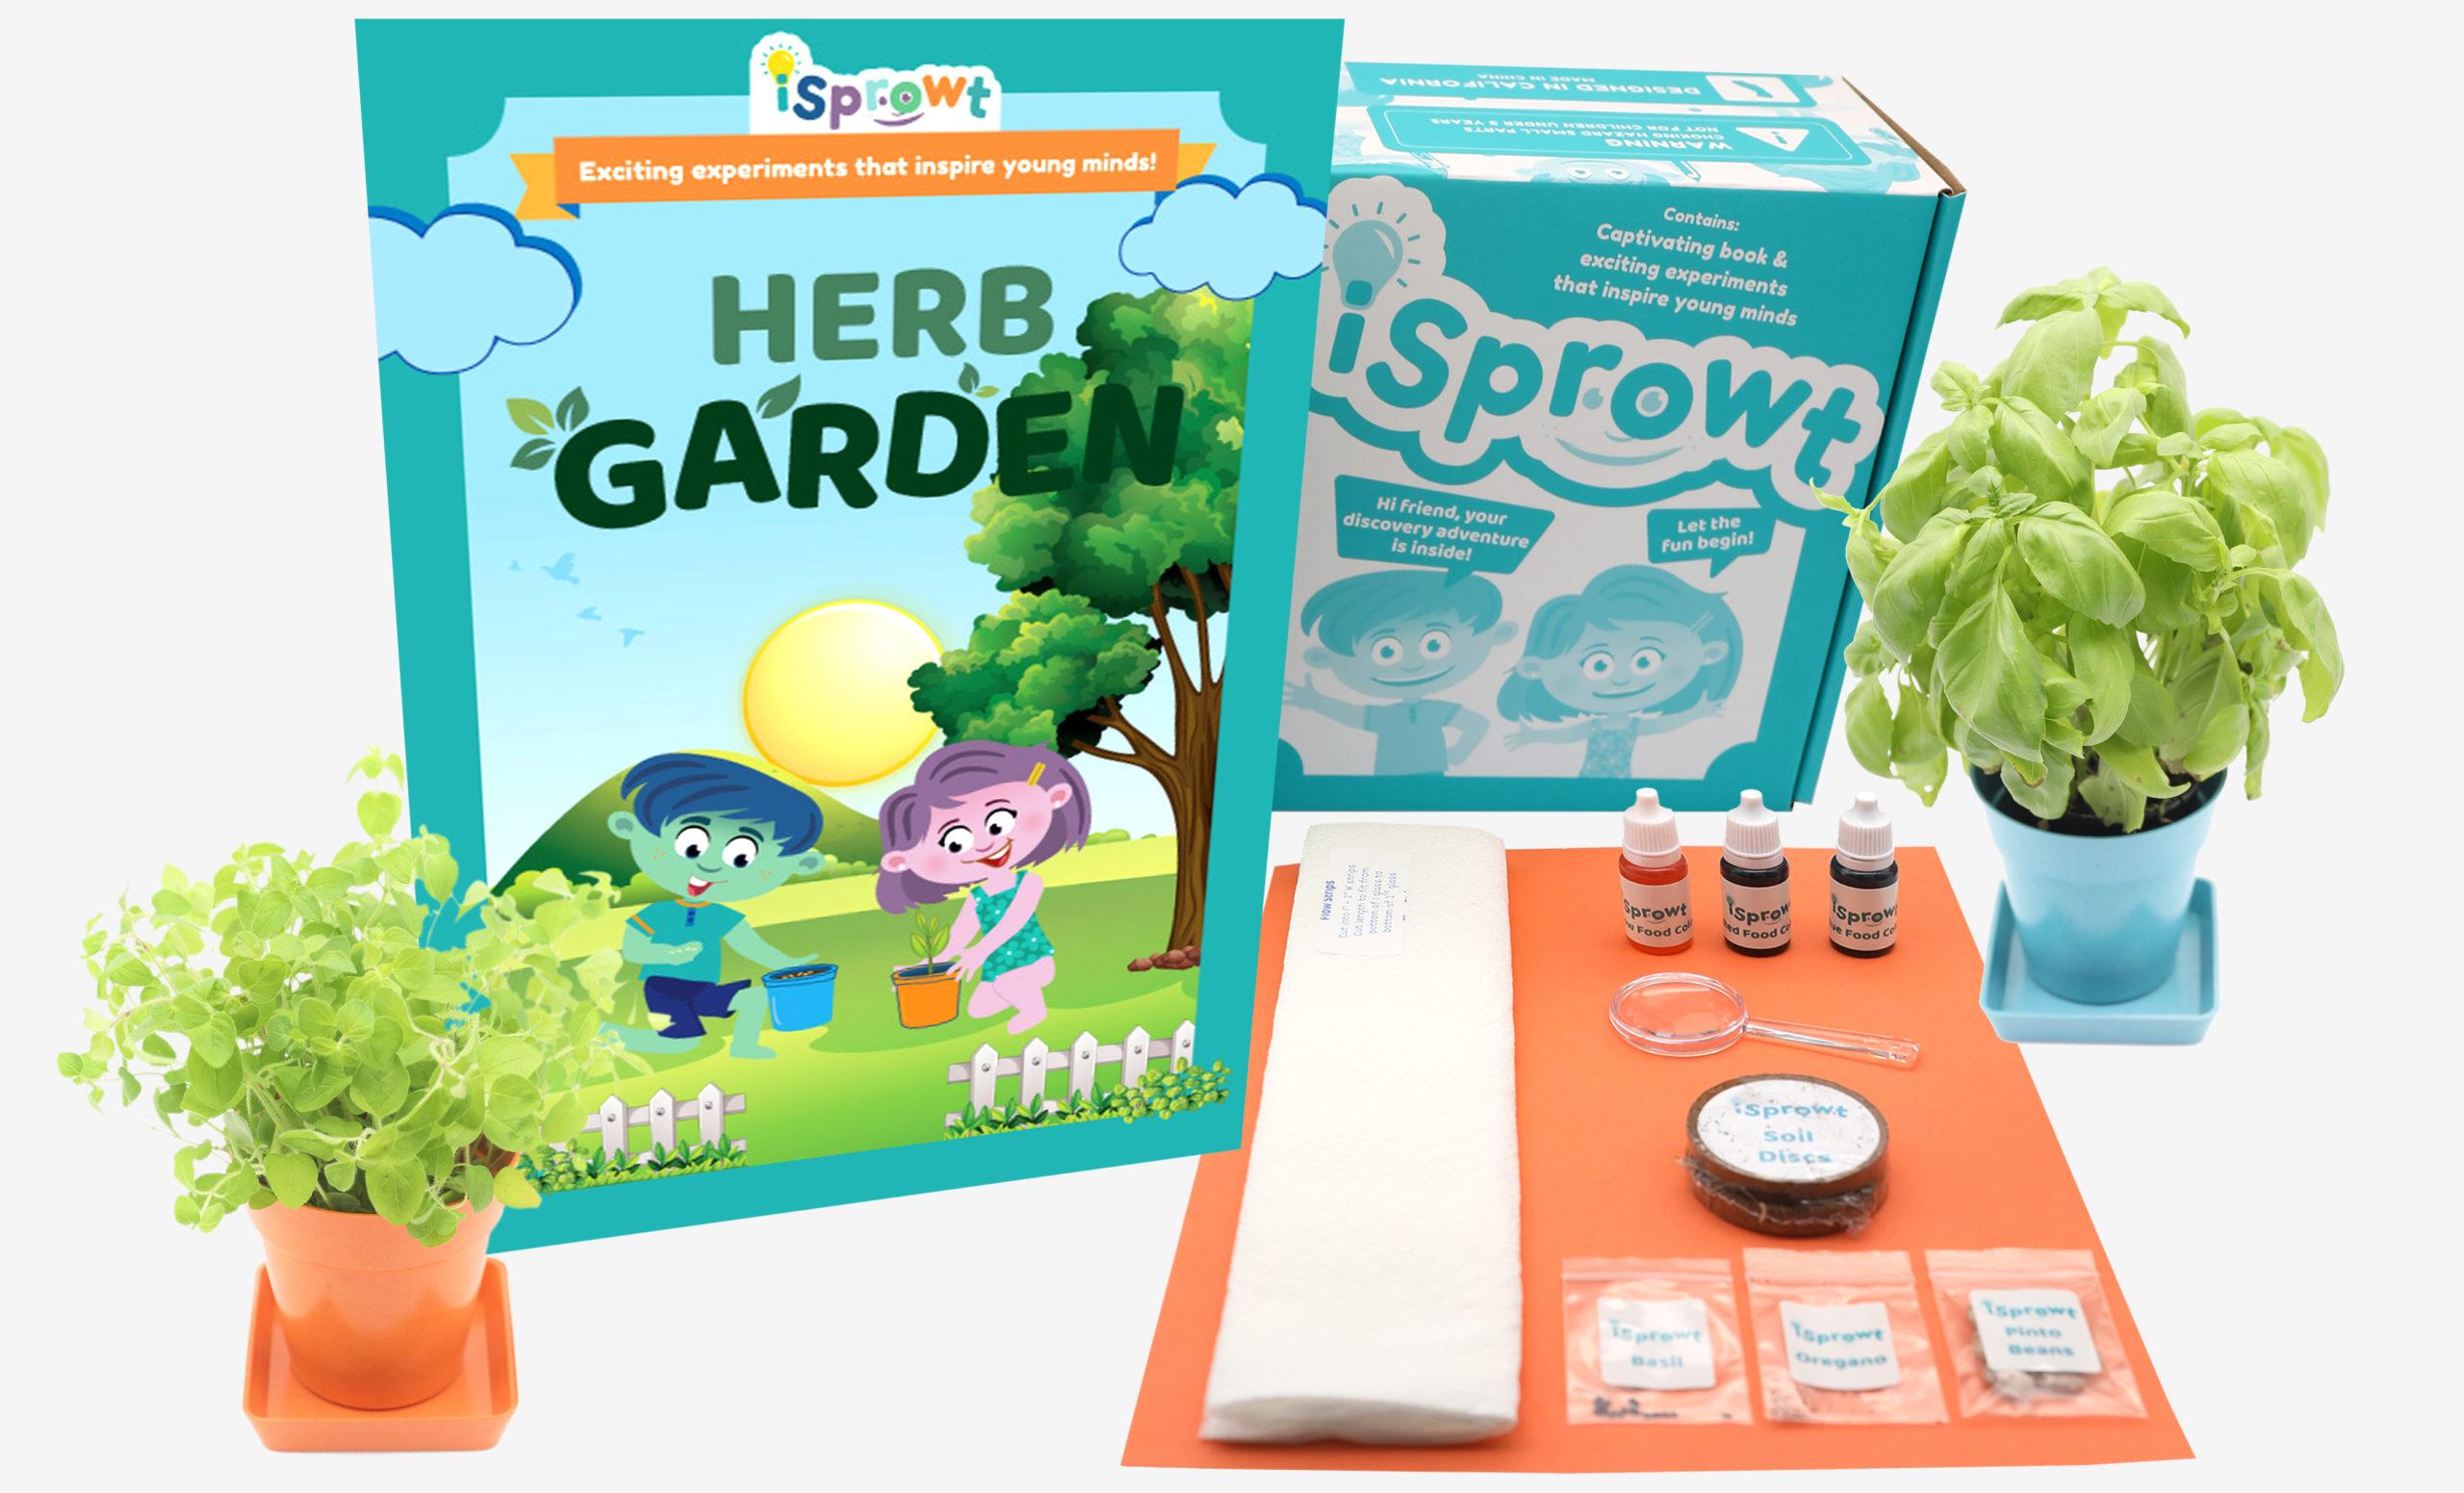 herb garden science kits for kids